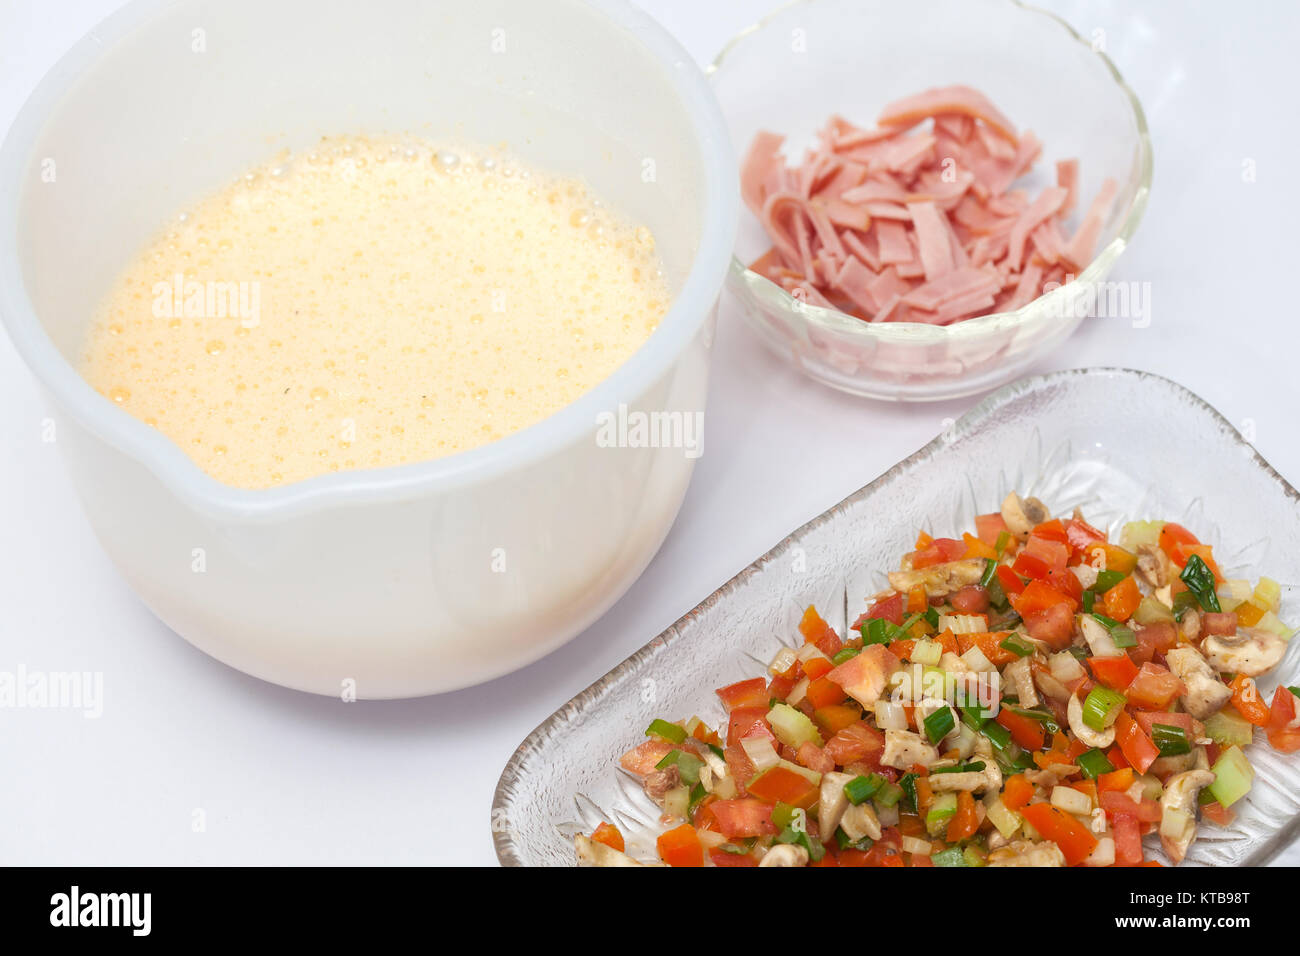 Omelet preparation : Vegetables, ham and scrambled eggs - Stock Image